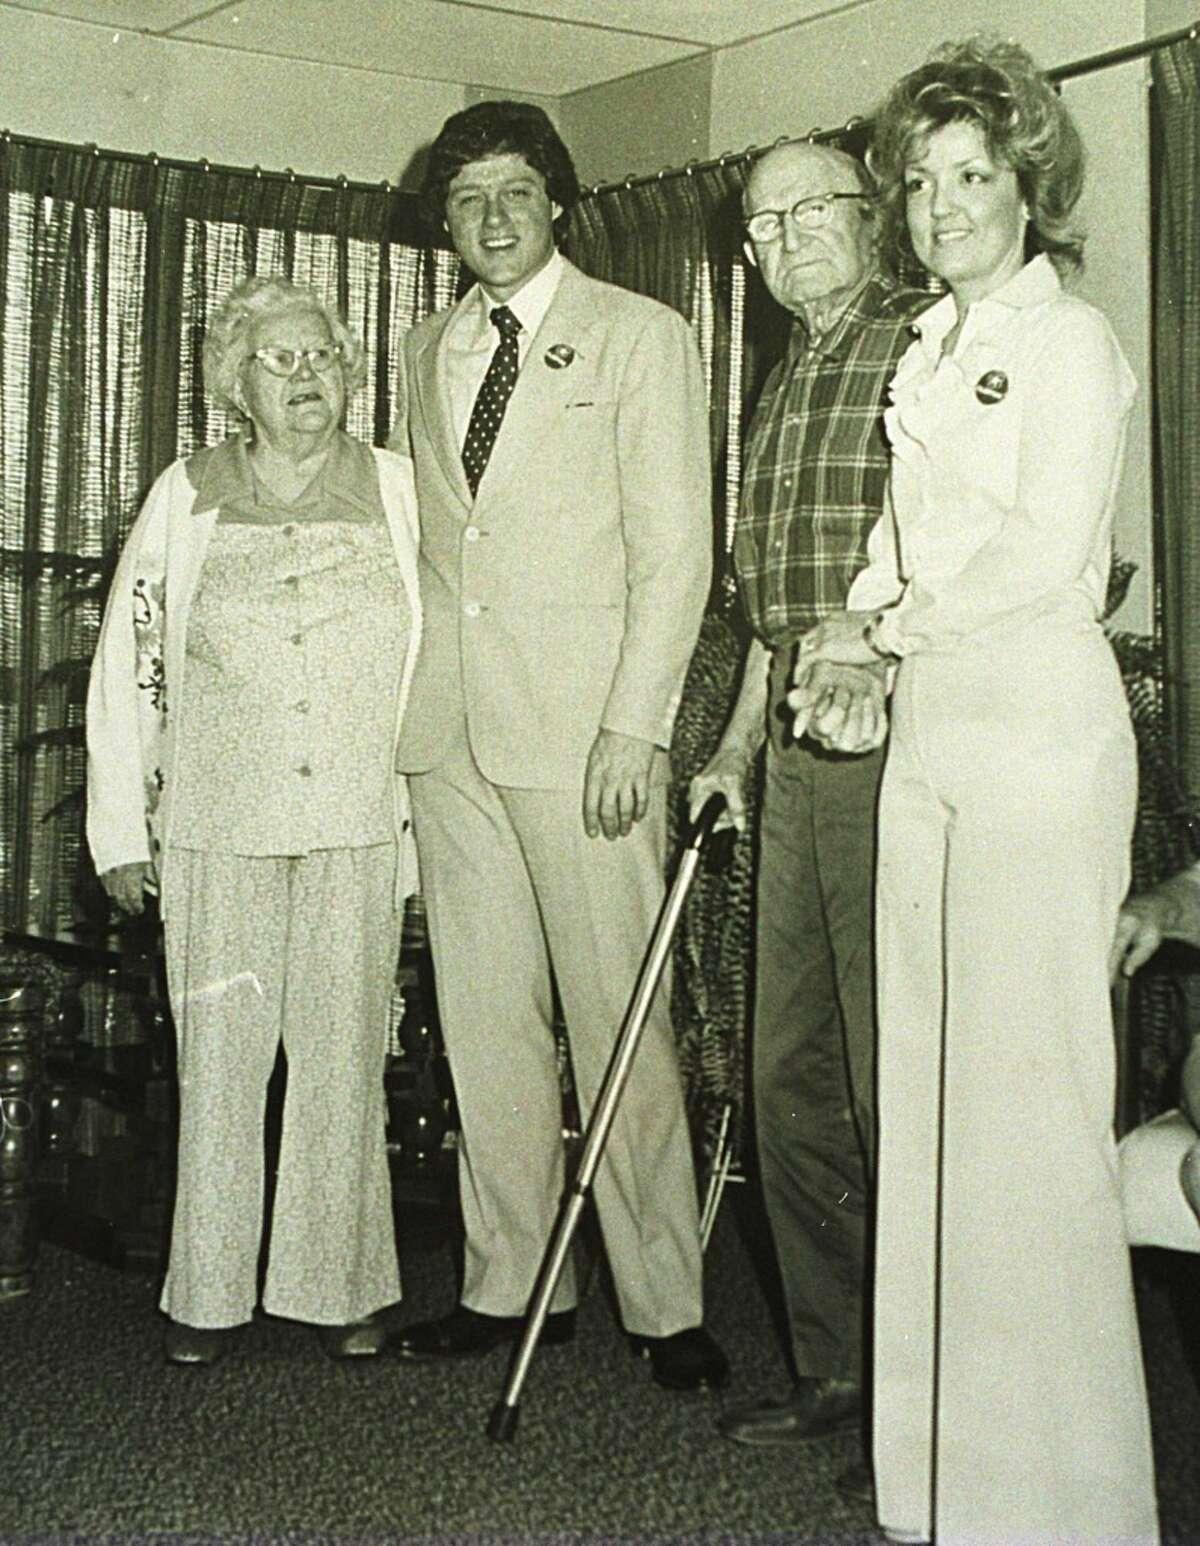 Bill Clinton on a visit to Juanita Broaddrick's (right) nursing home in Van Buren, Ark., circa 1978.